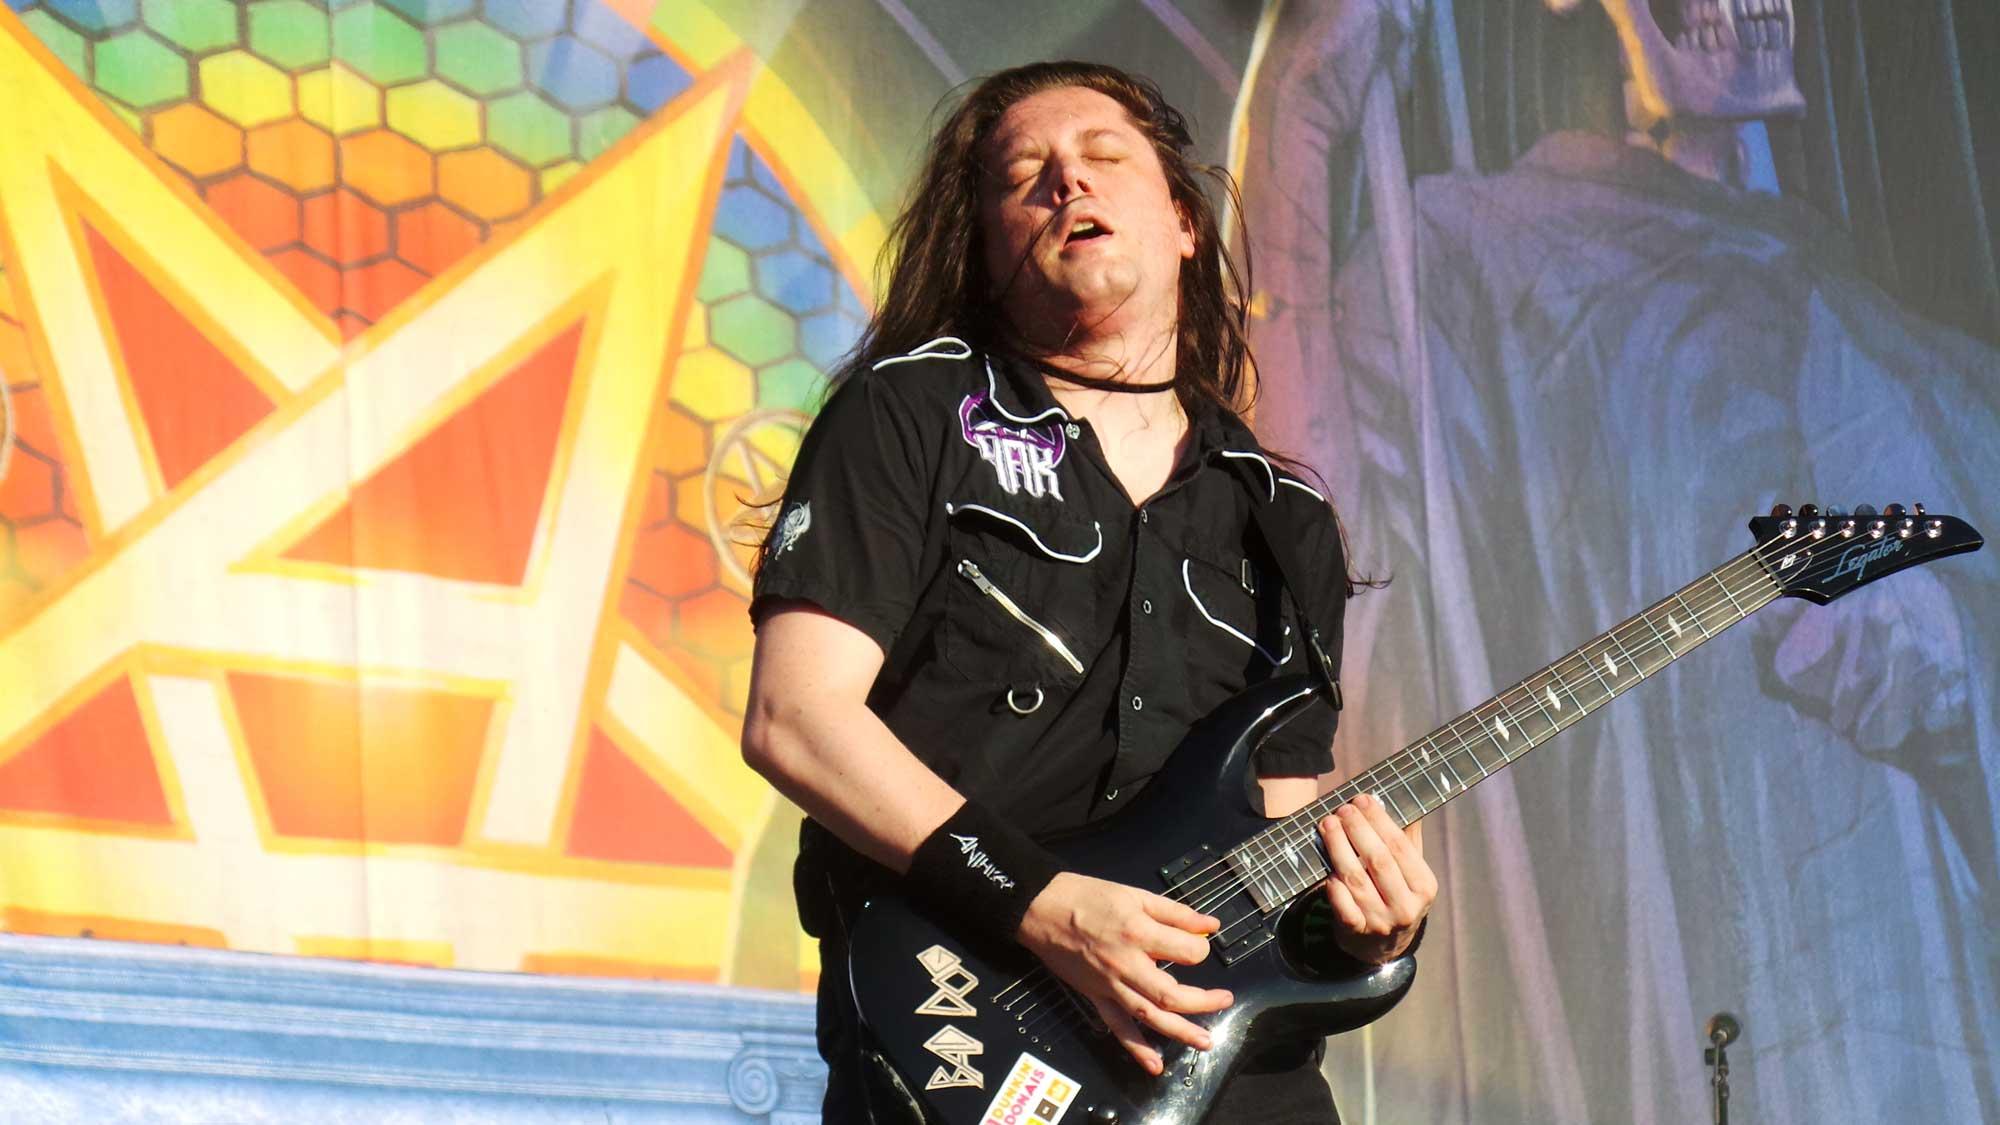 Jonathan Donais, guitarrista al grup Anthrax, actuant al Rock Fest 2016 a Santa Coloma de Gramenet.